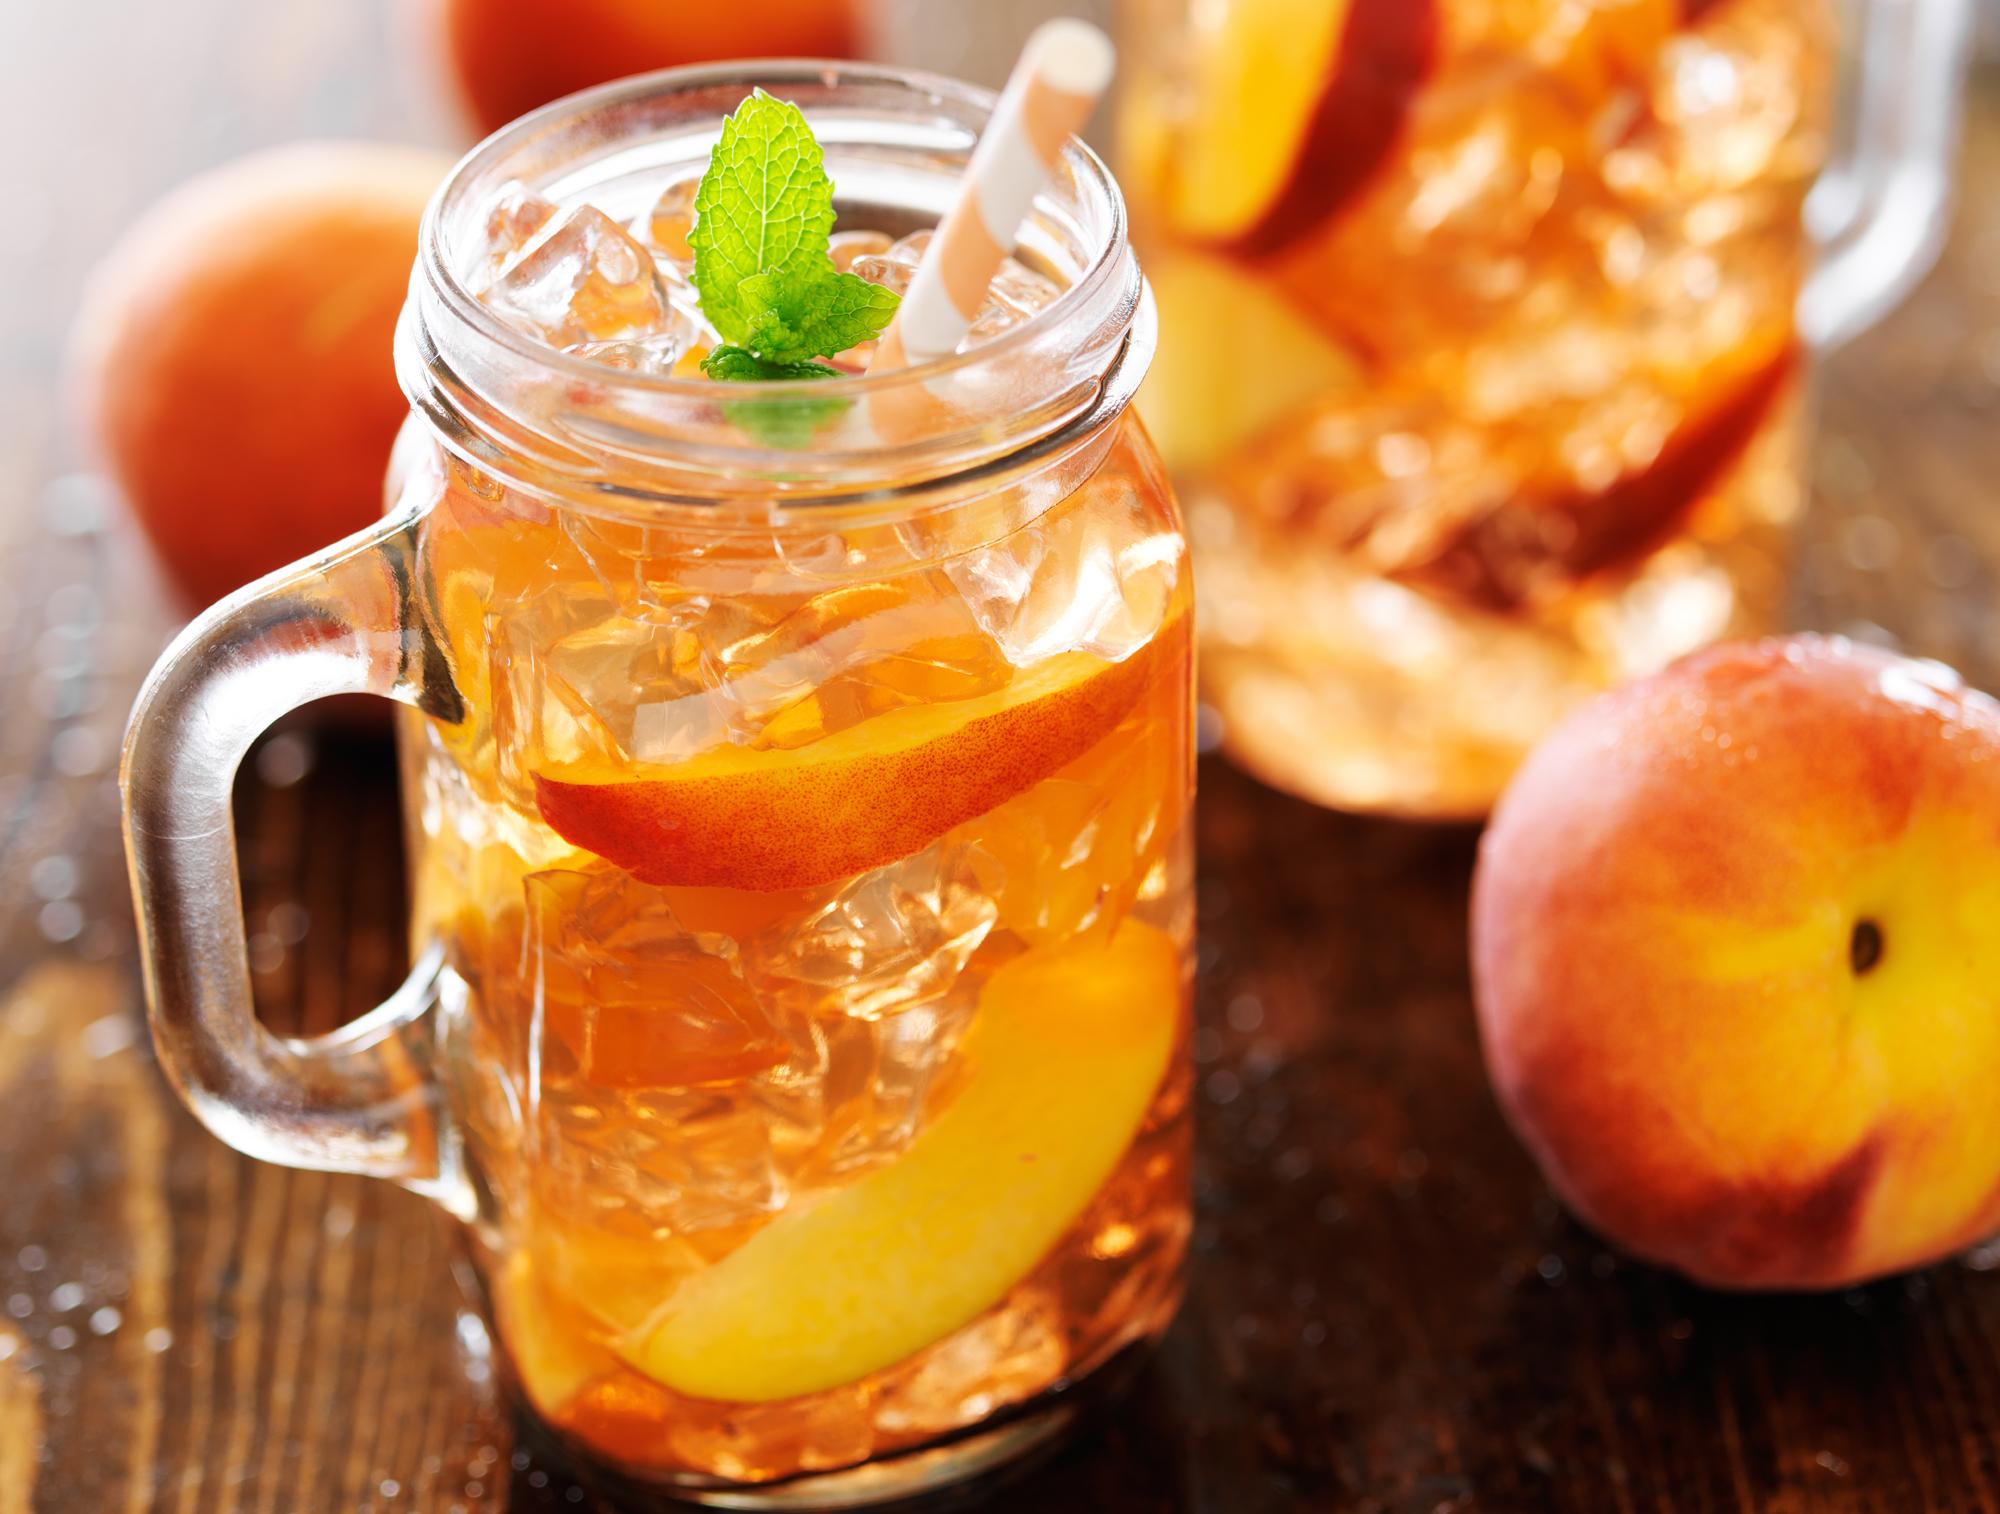 Recipe: Peachy green tea cooler - Easy Health Options®